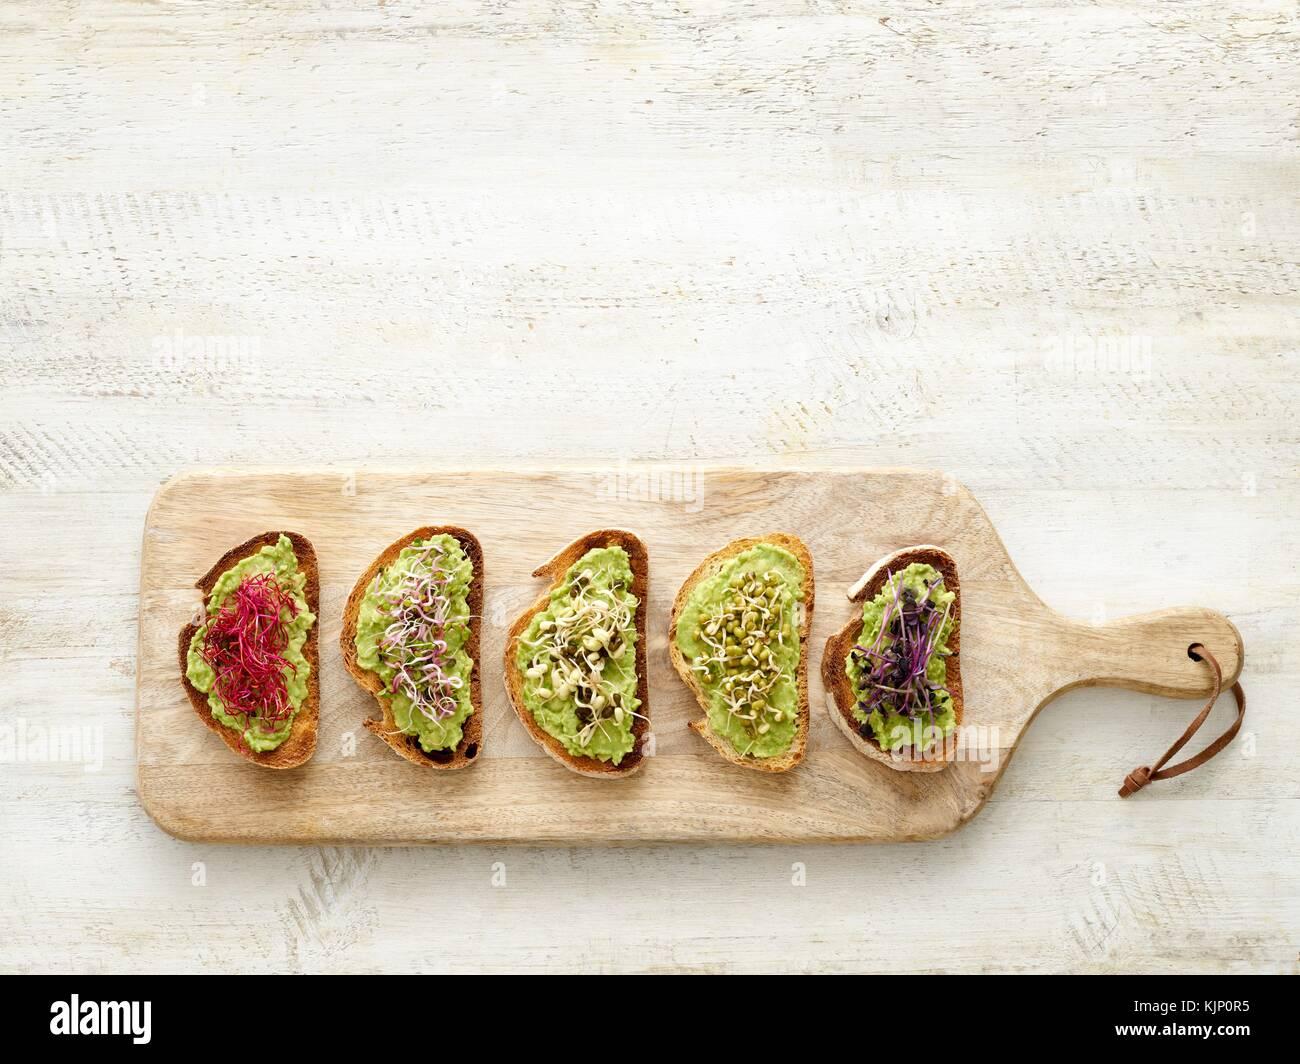 Bruschetta on a wooden chopping board. - Stock Image